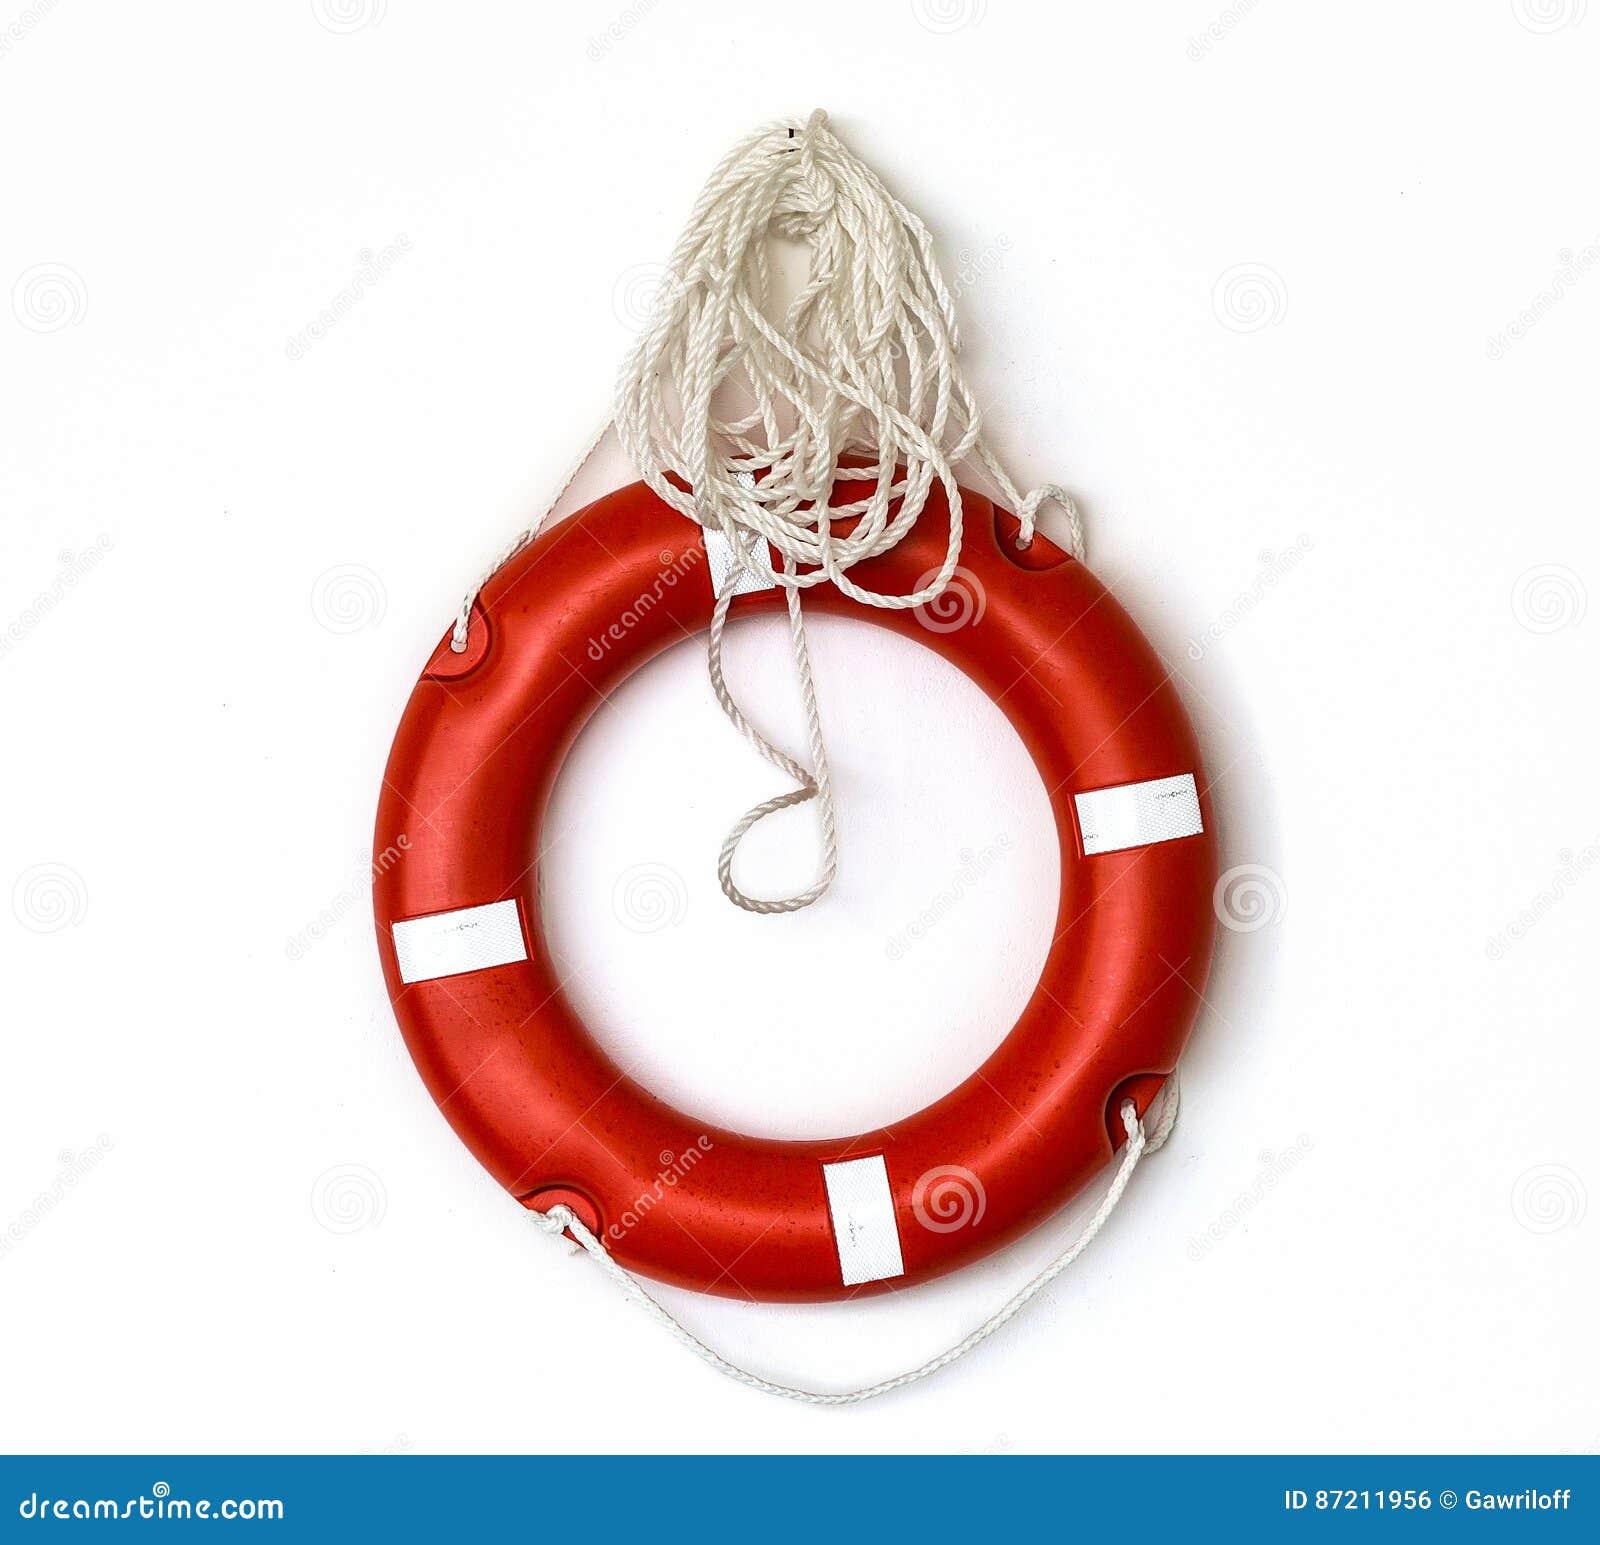 Red lifebuoy isolated over white background